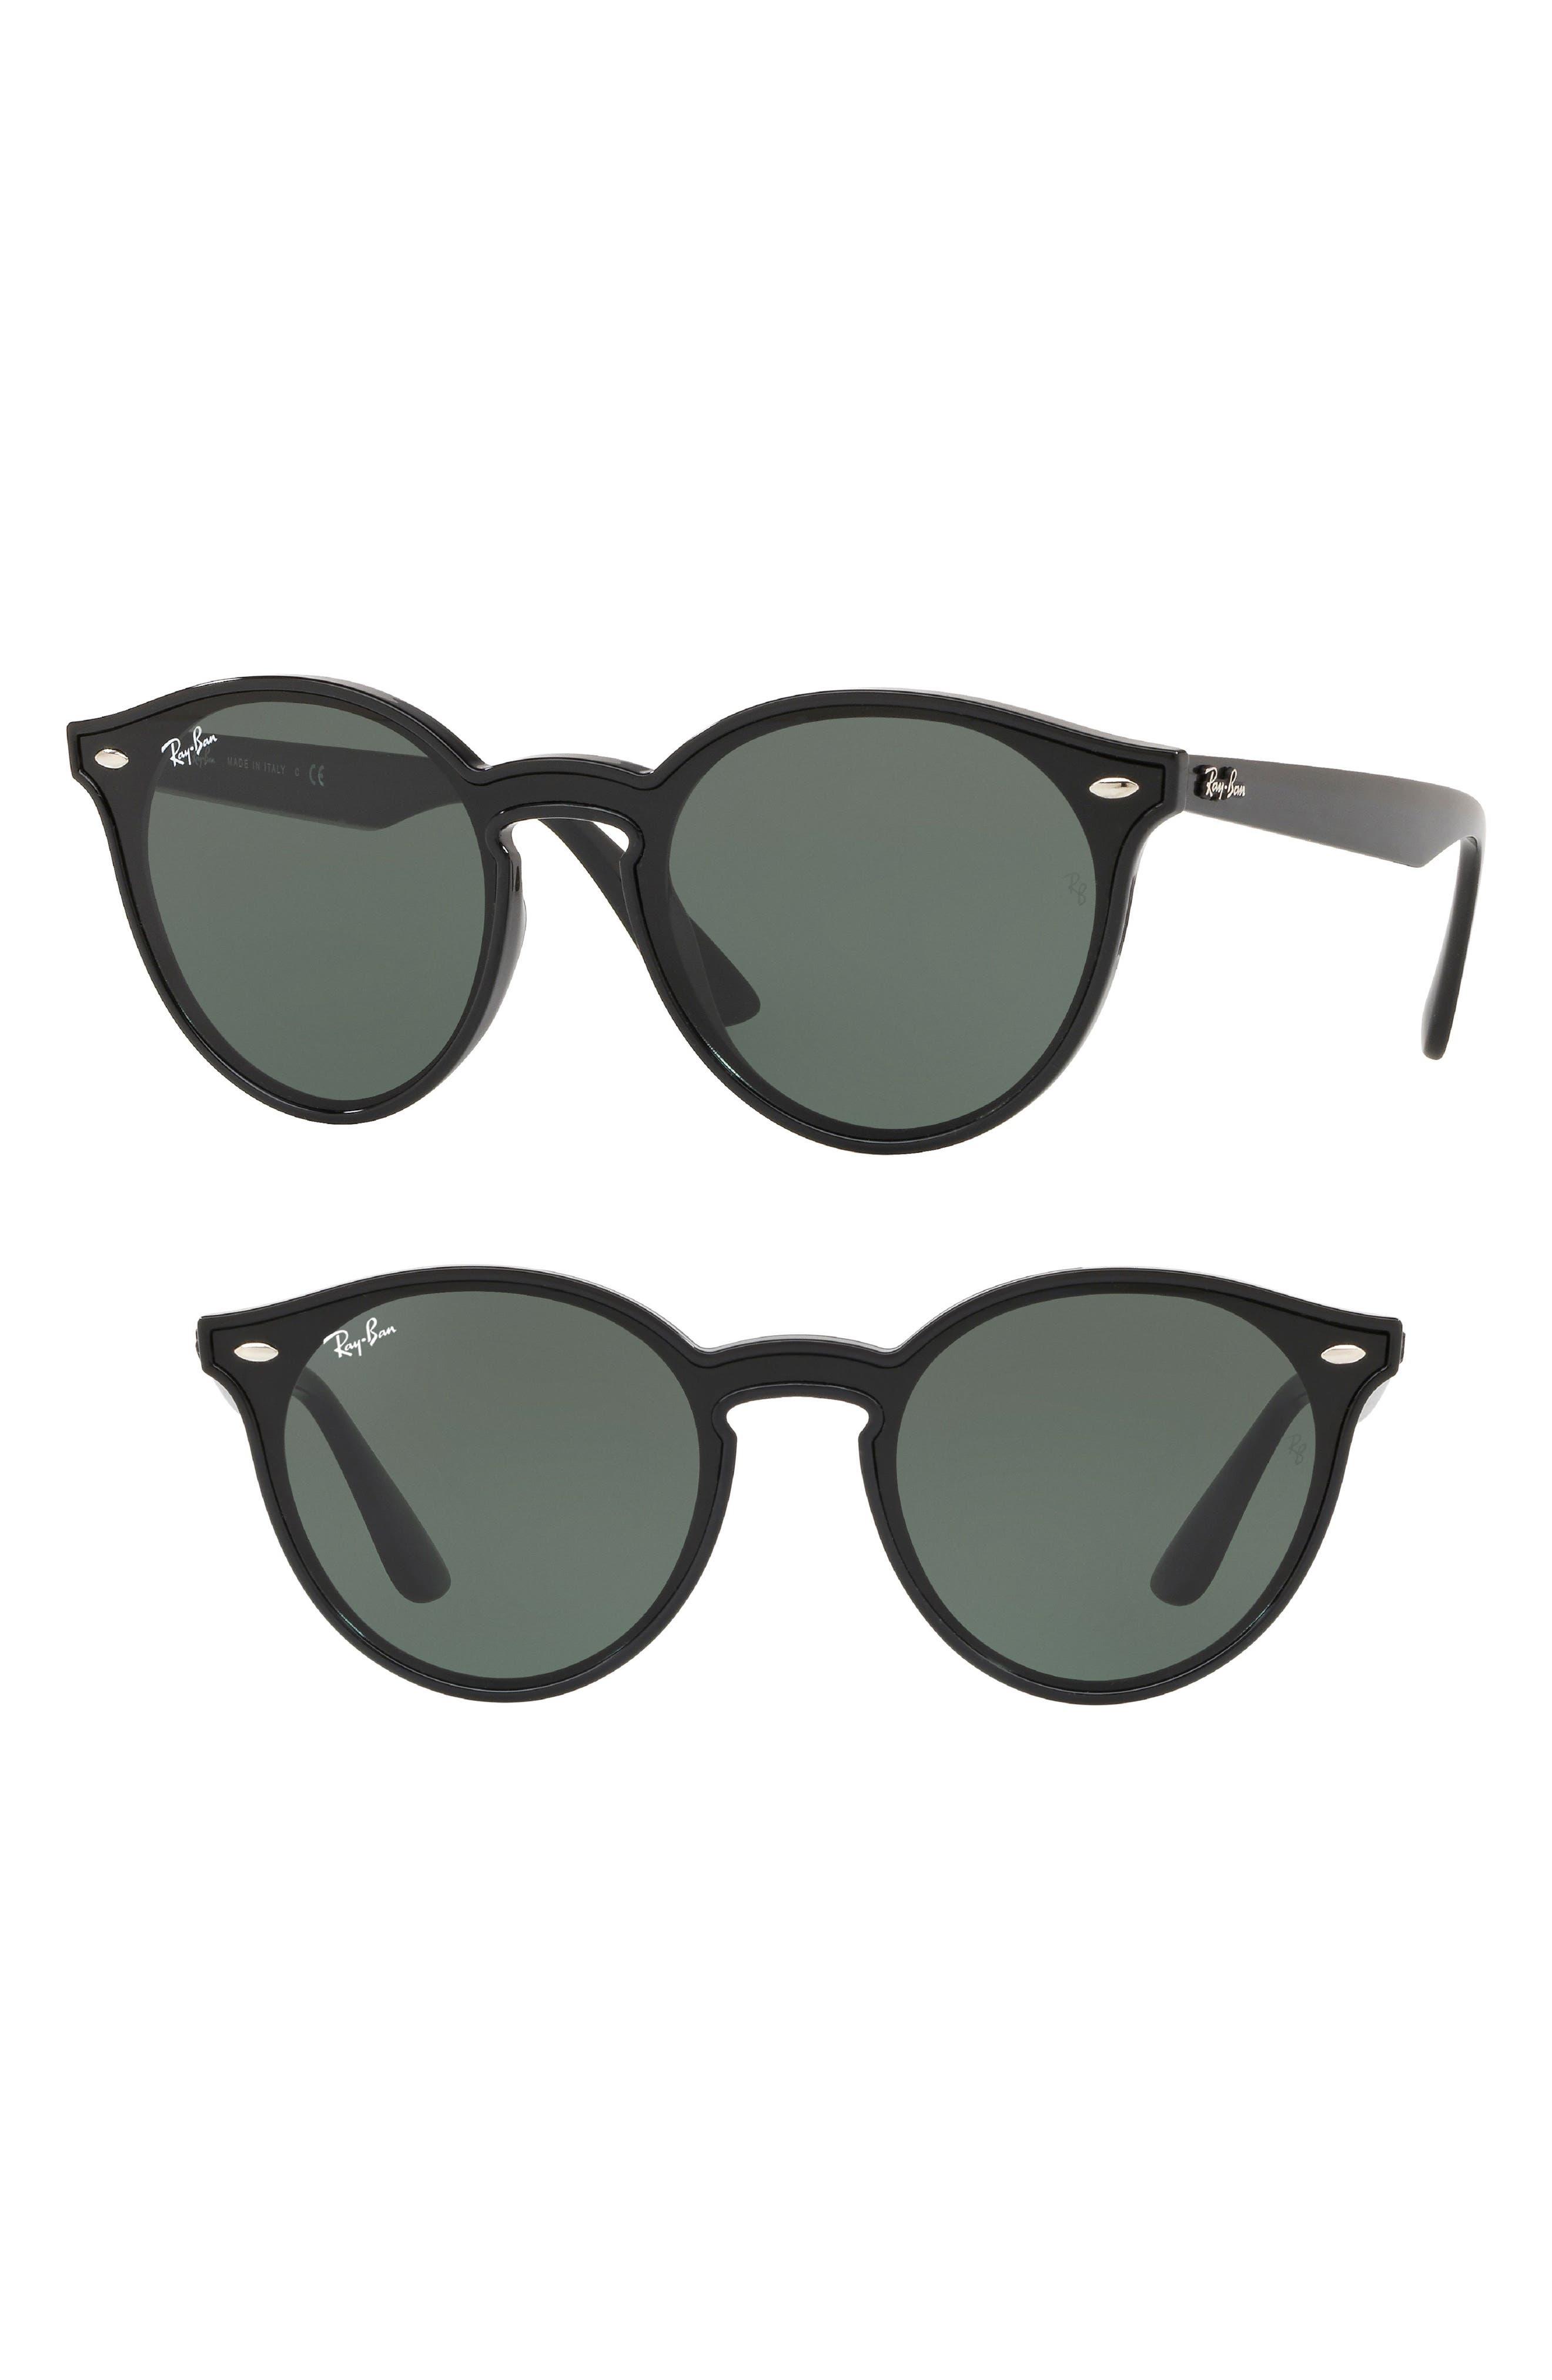 Ray-Ban Blaze 37Mm Round Sunglasses - Black Solid